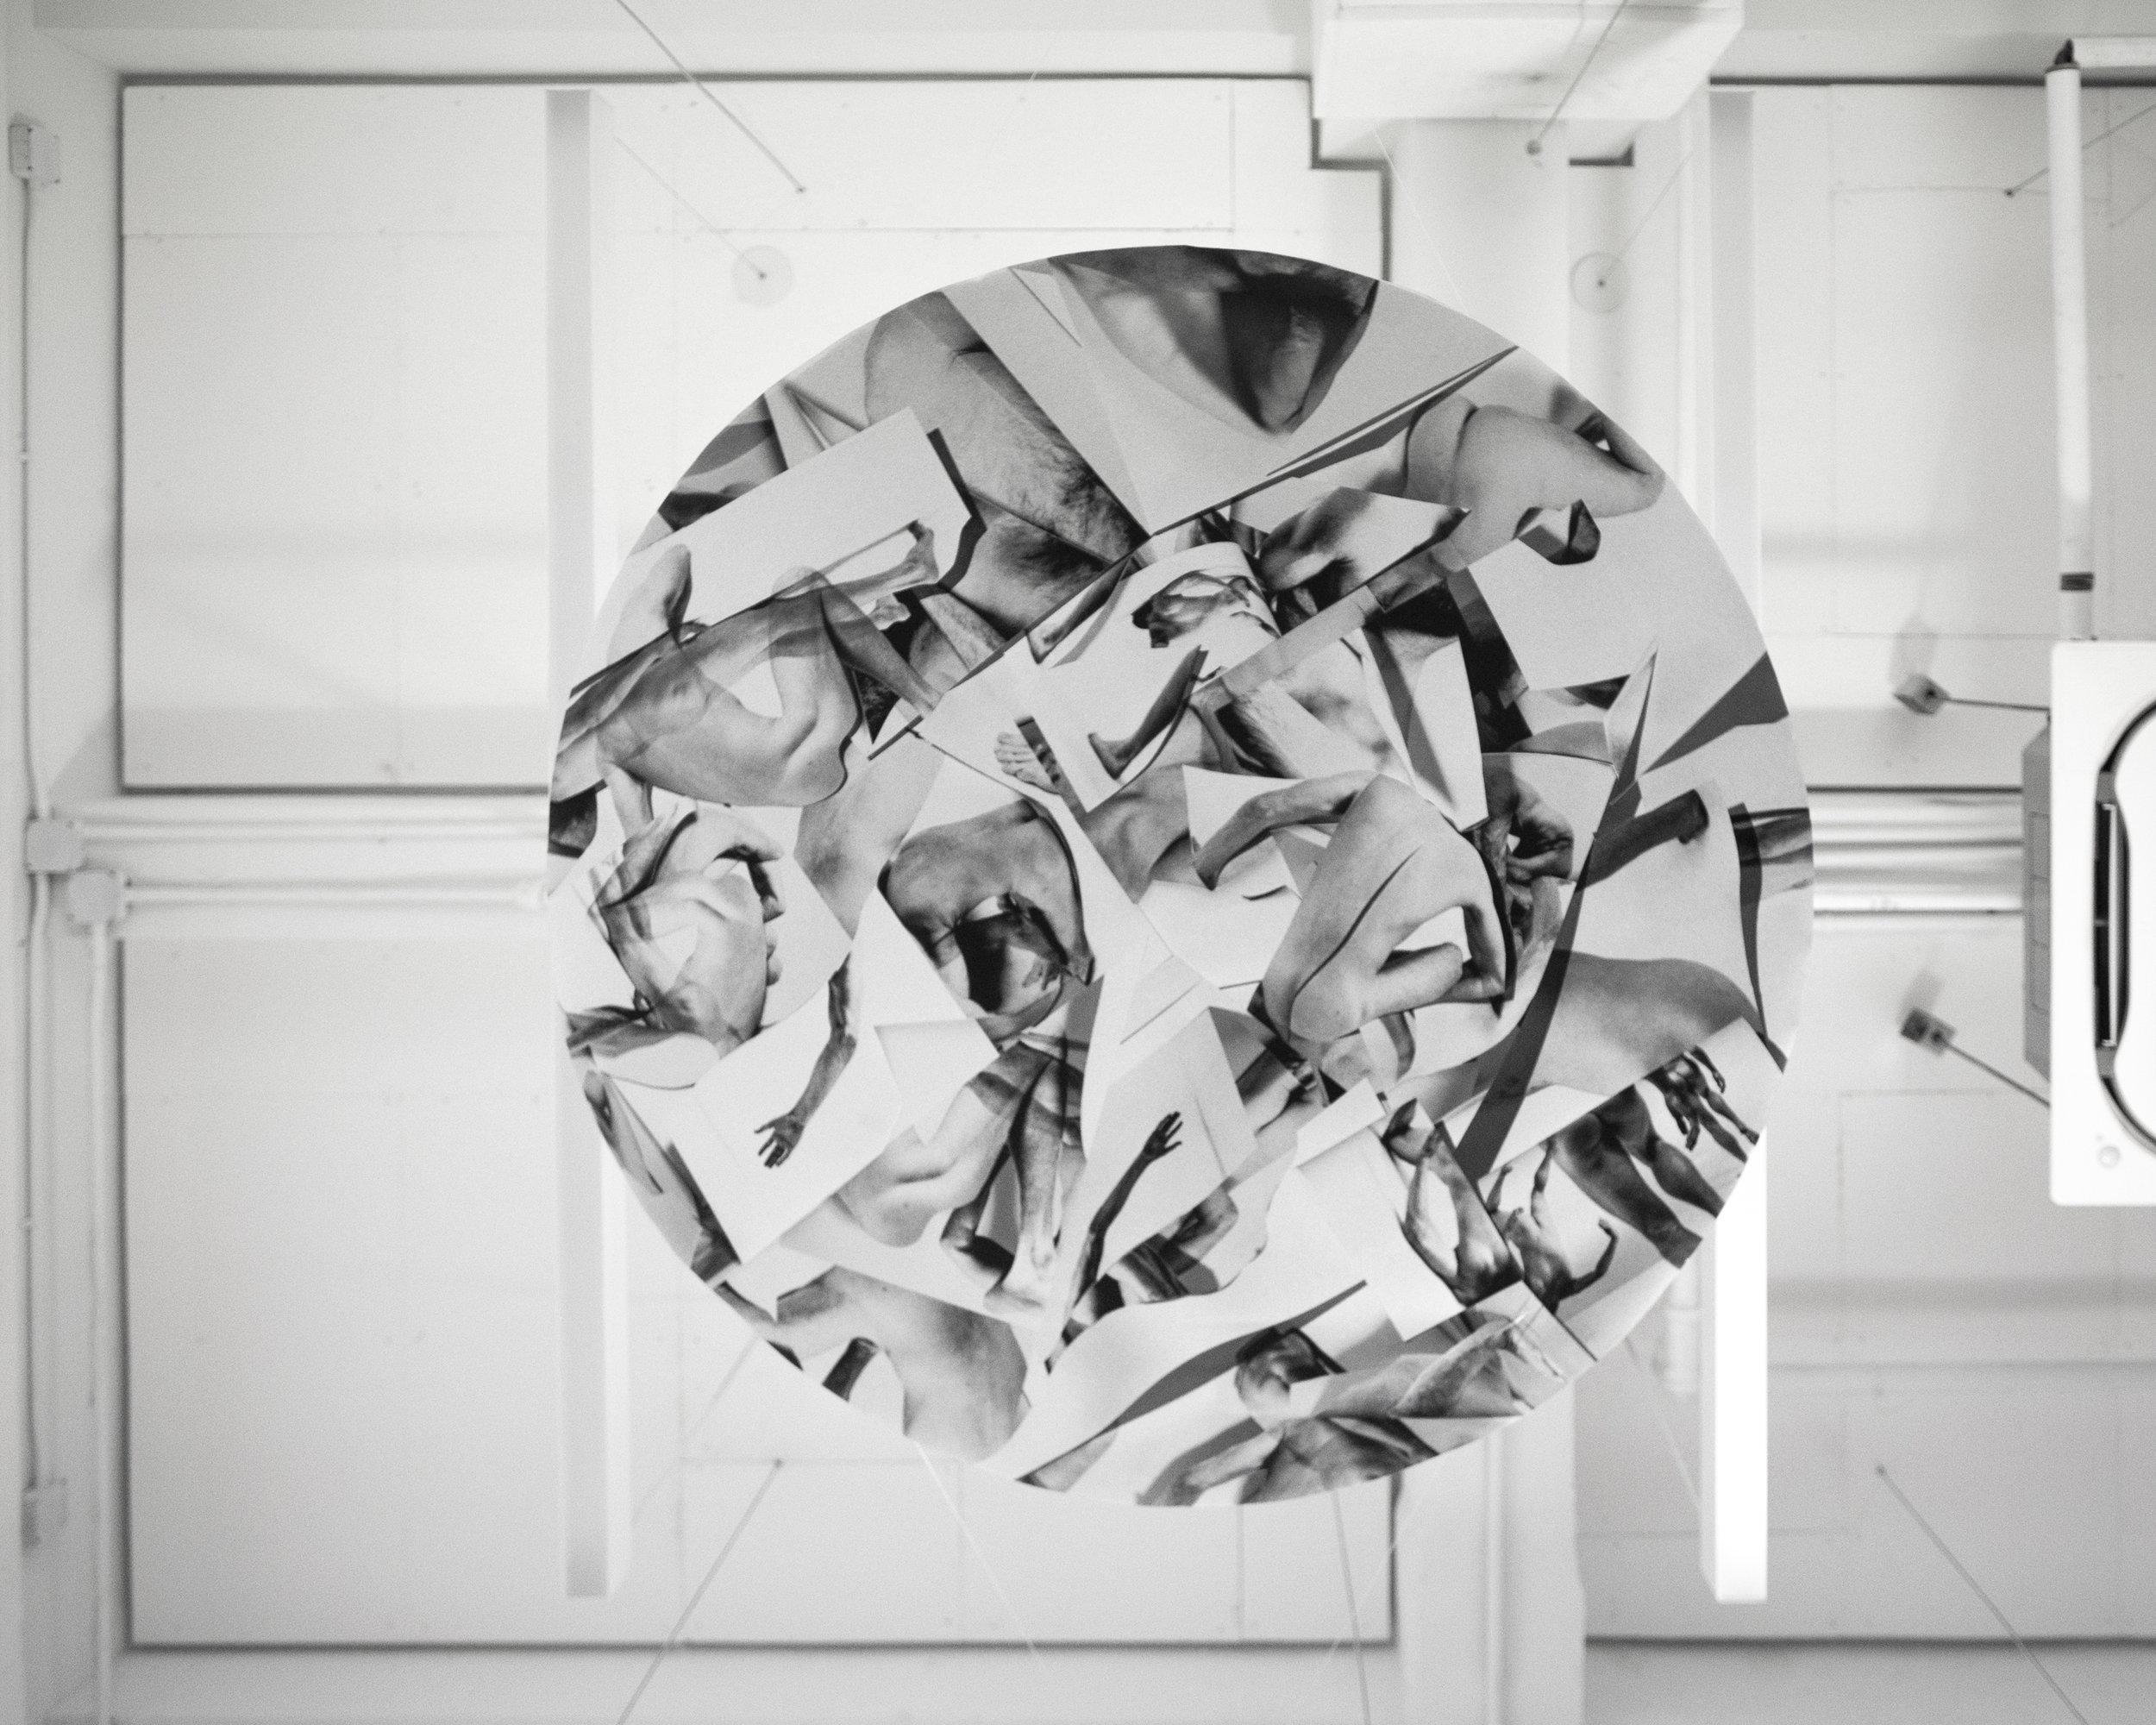 Scraps   2019  Inkjet print and round frame  65 inch diameter